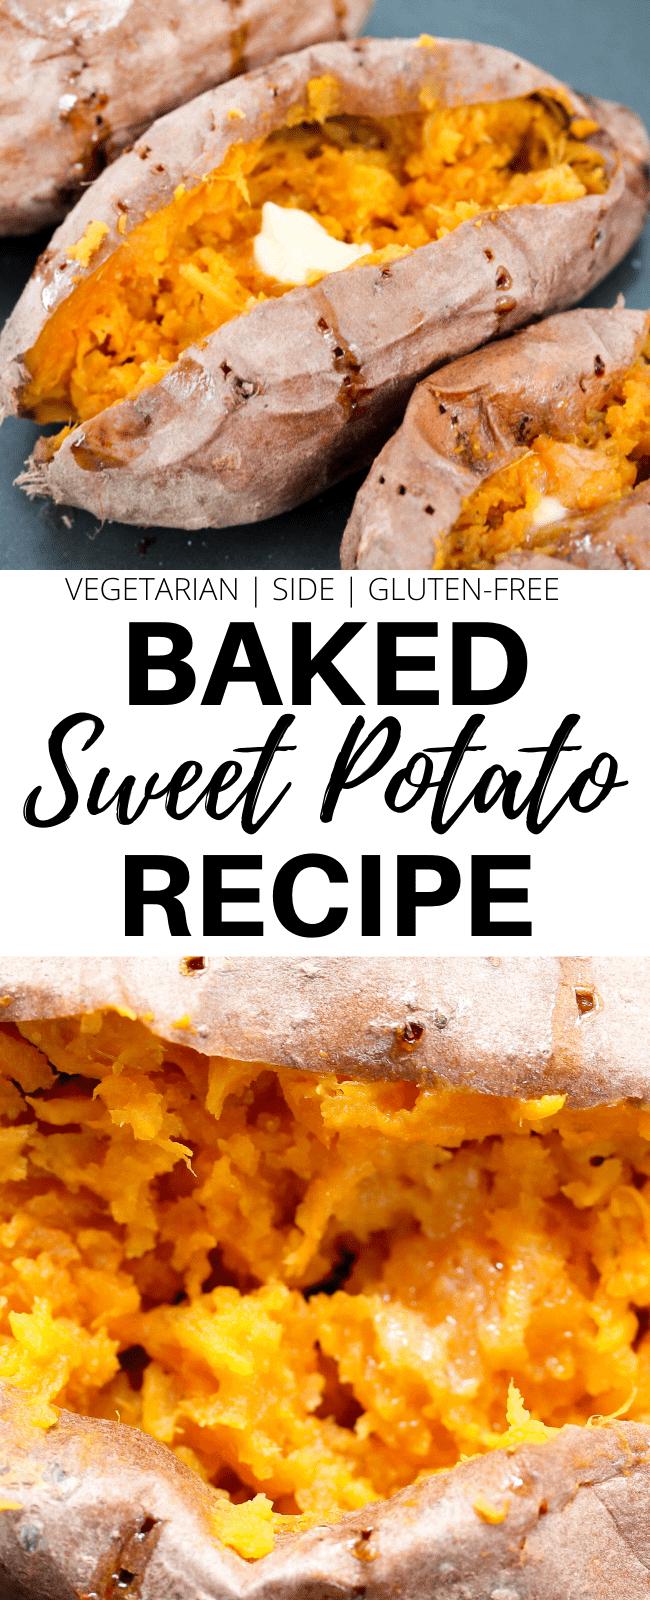 baked_sweet_potato_recipe